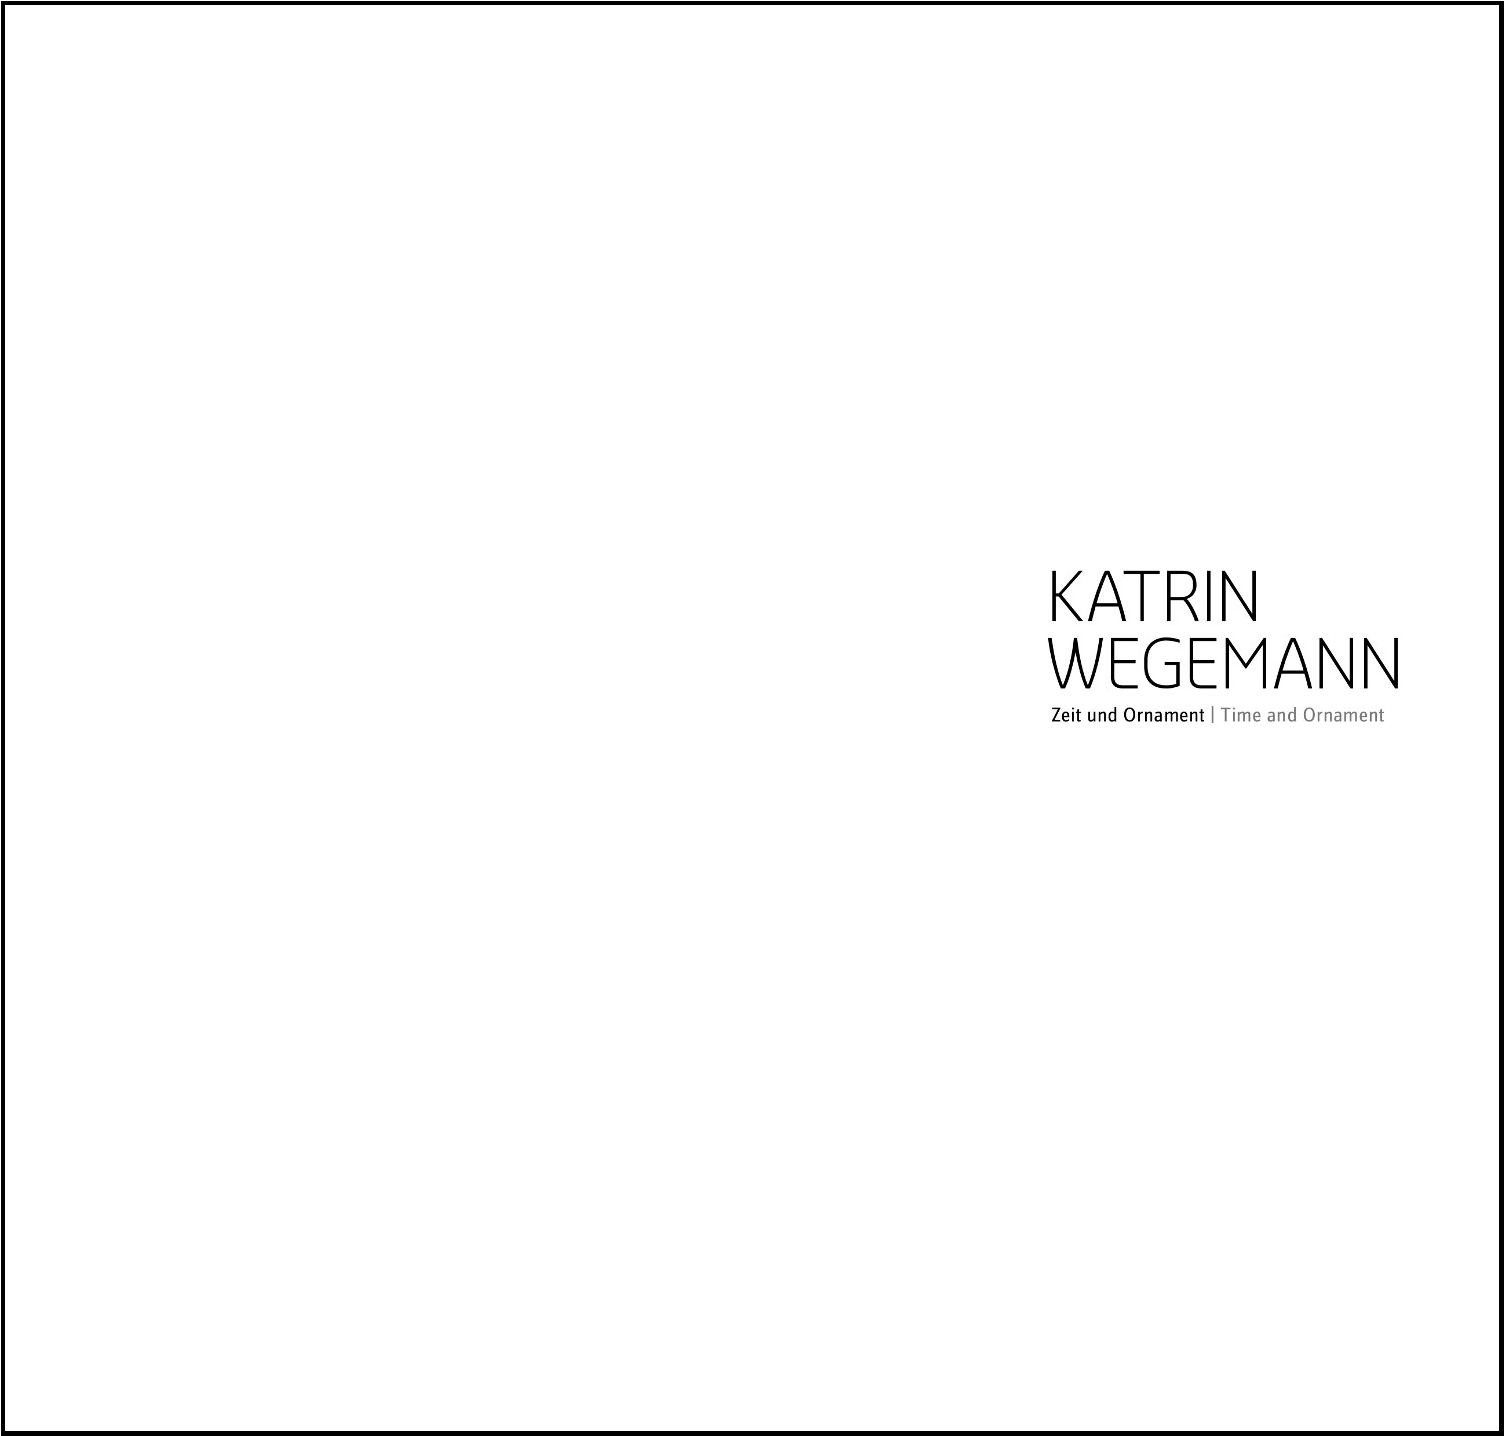 Einzelkatalog – Katrin Wegemann